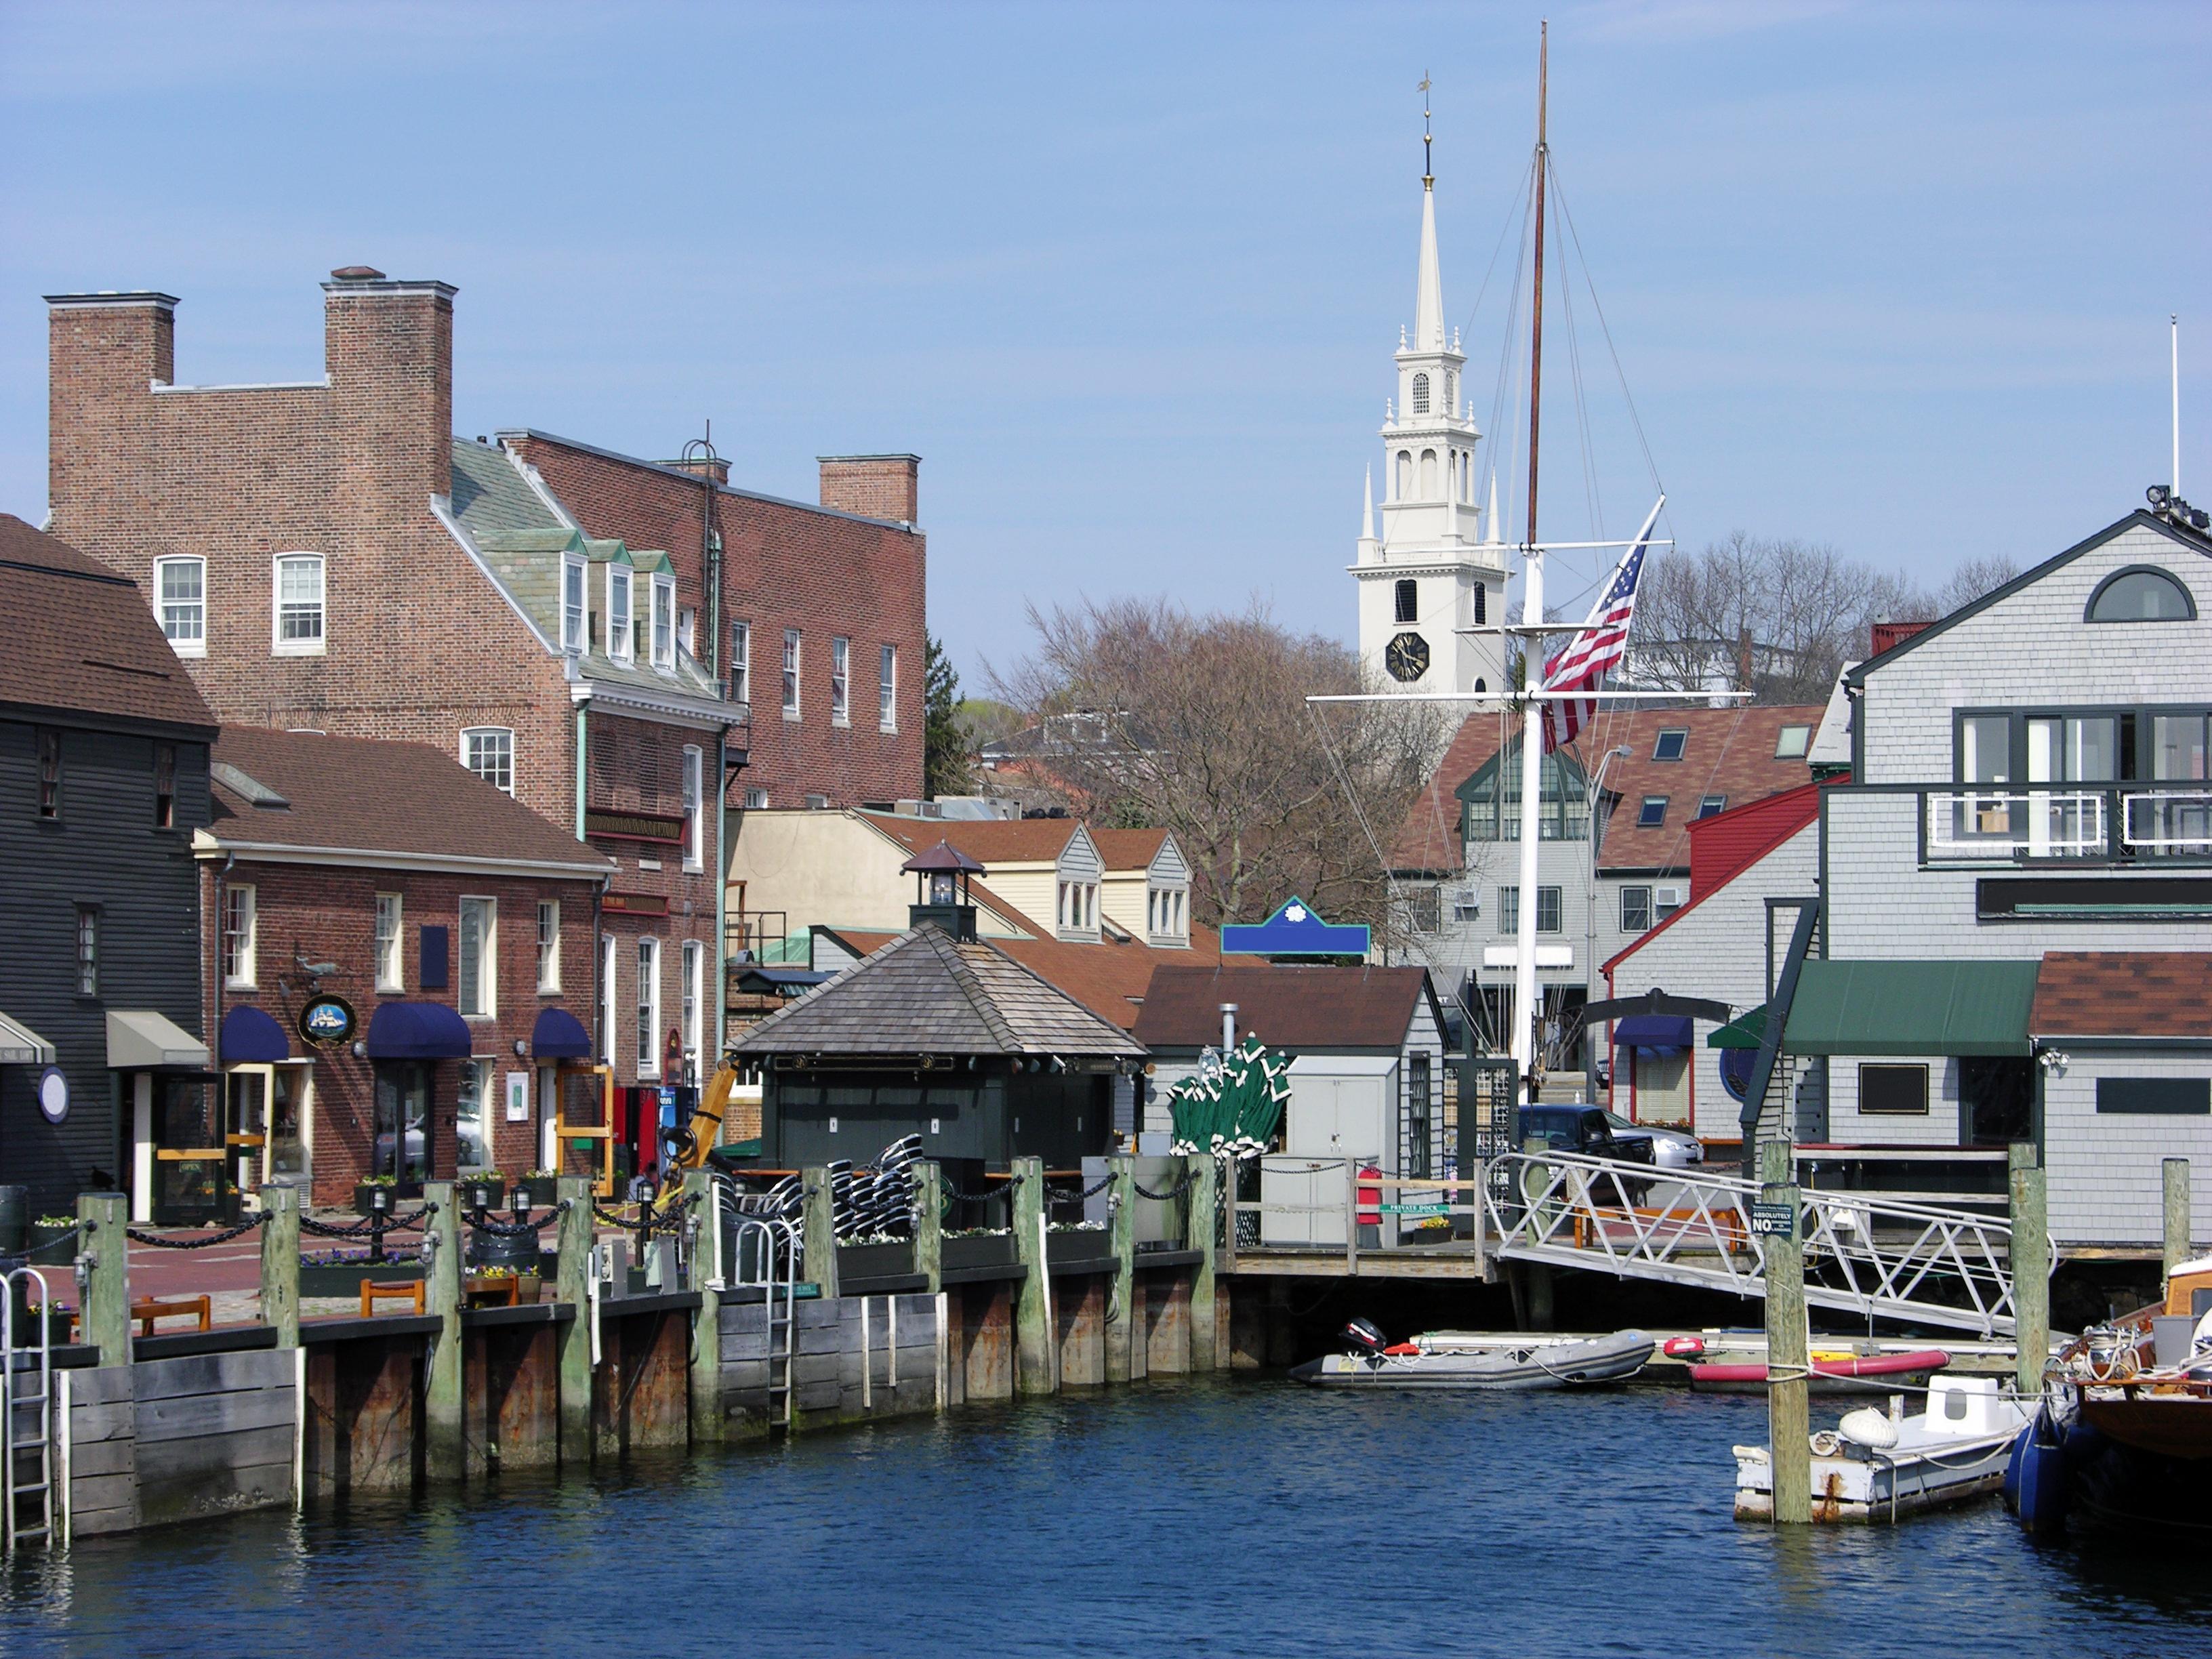 How to Spend 3 Days in Newport, Rhode Island